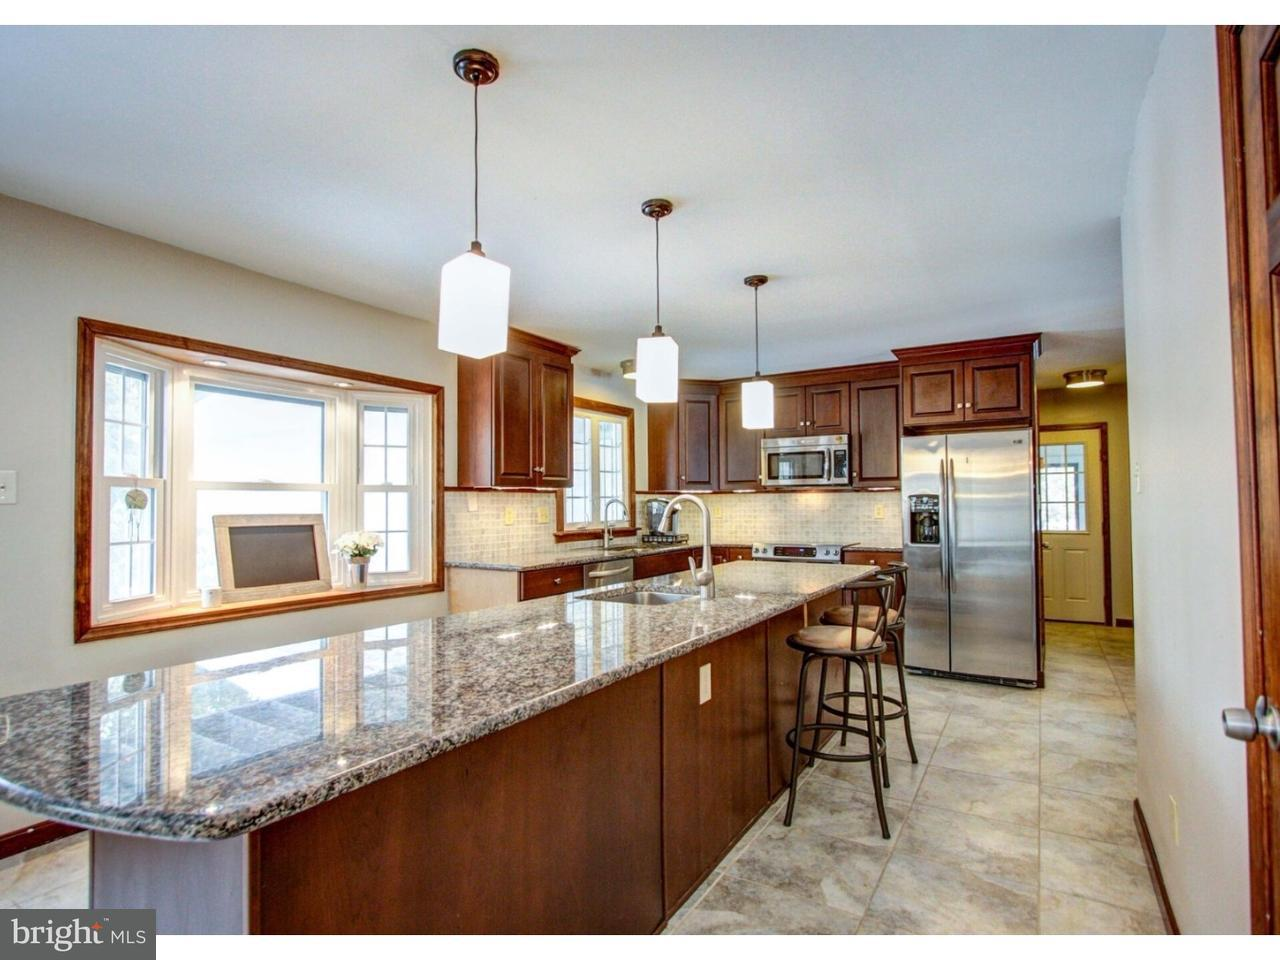 Single Family Home for Sale at 108 JEM Drive Upper Dublin, Pennsylvania 19002 United States